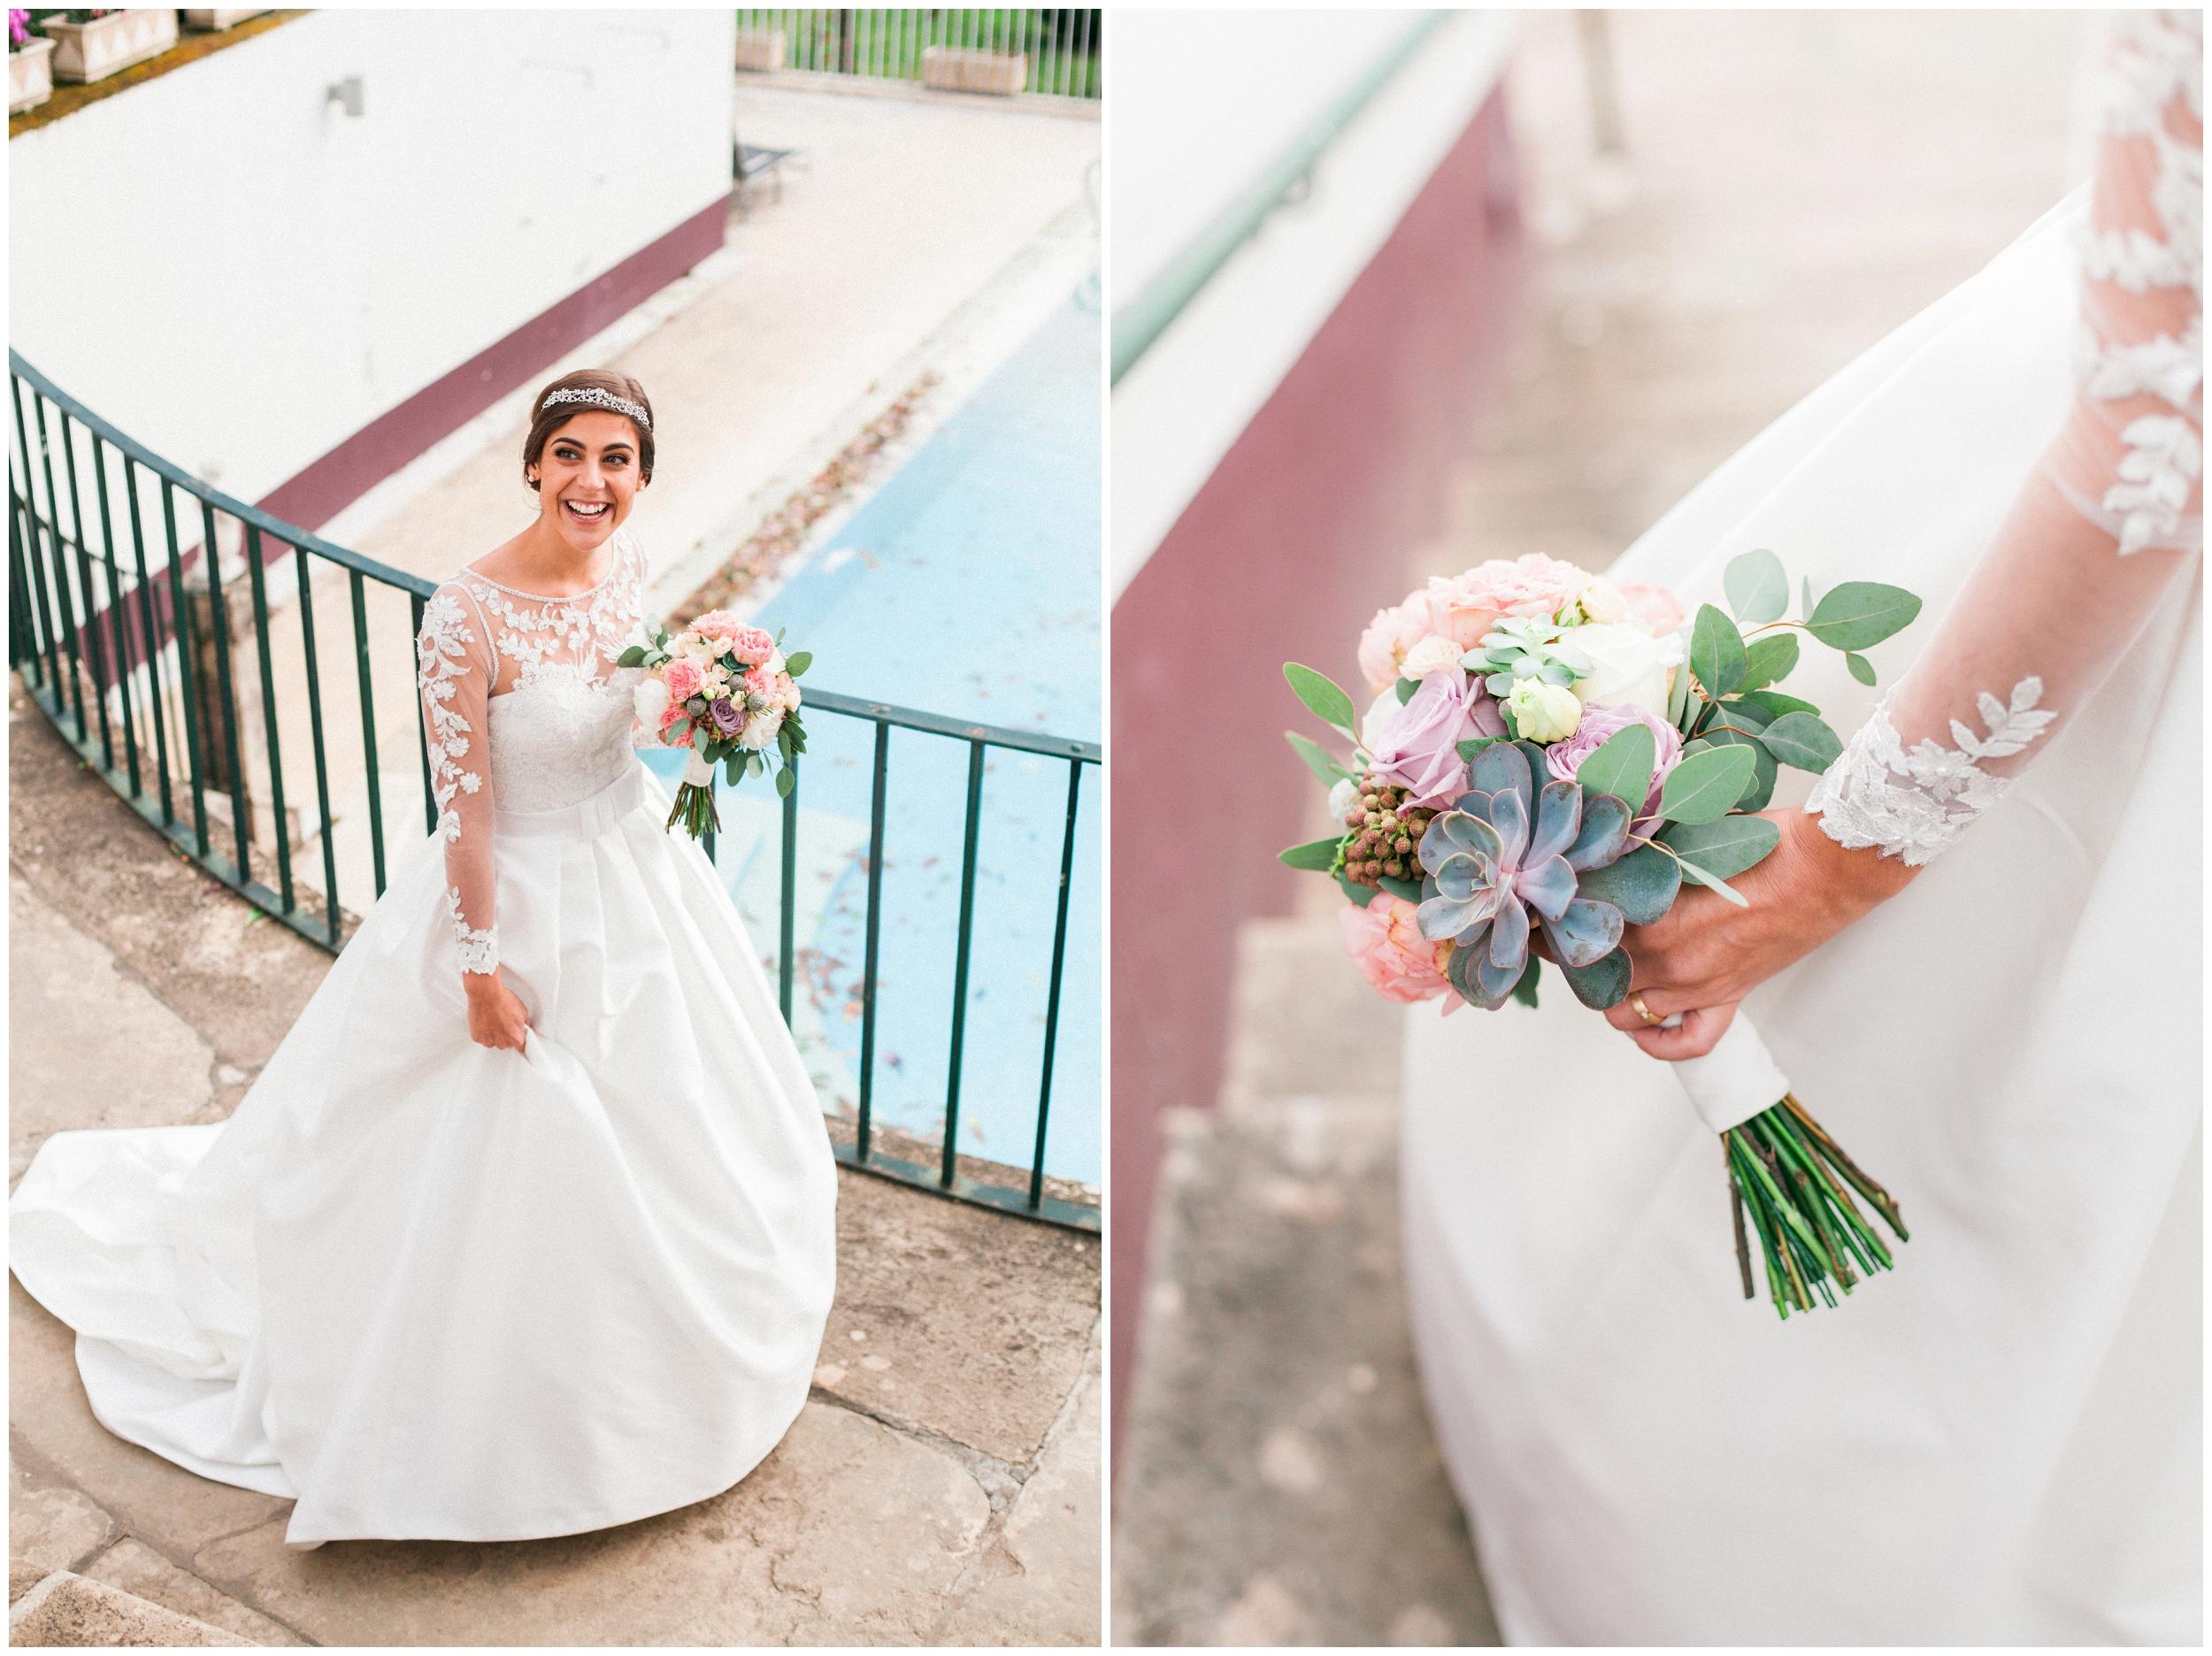 maria+rao+photography+wedding+palacio+lousa_0009.jpg